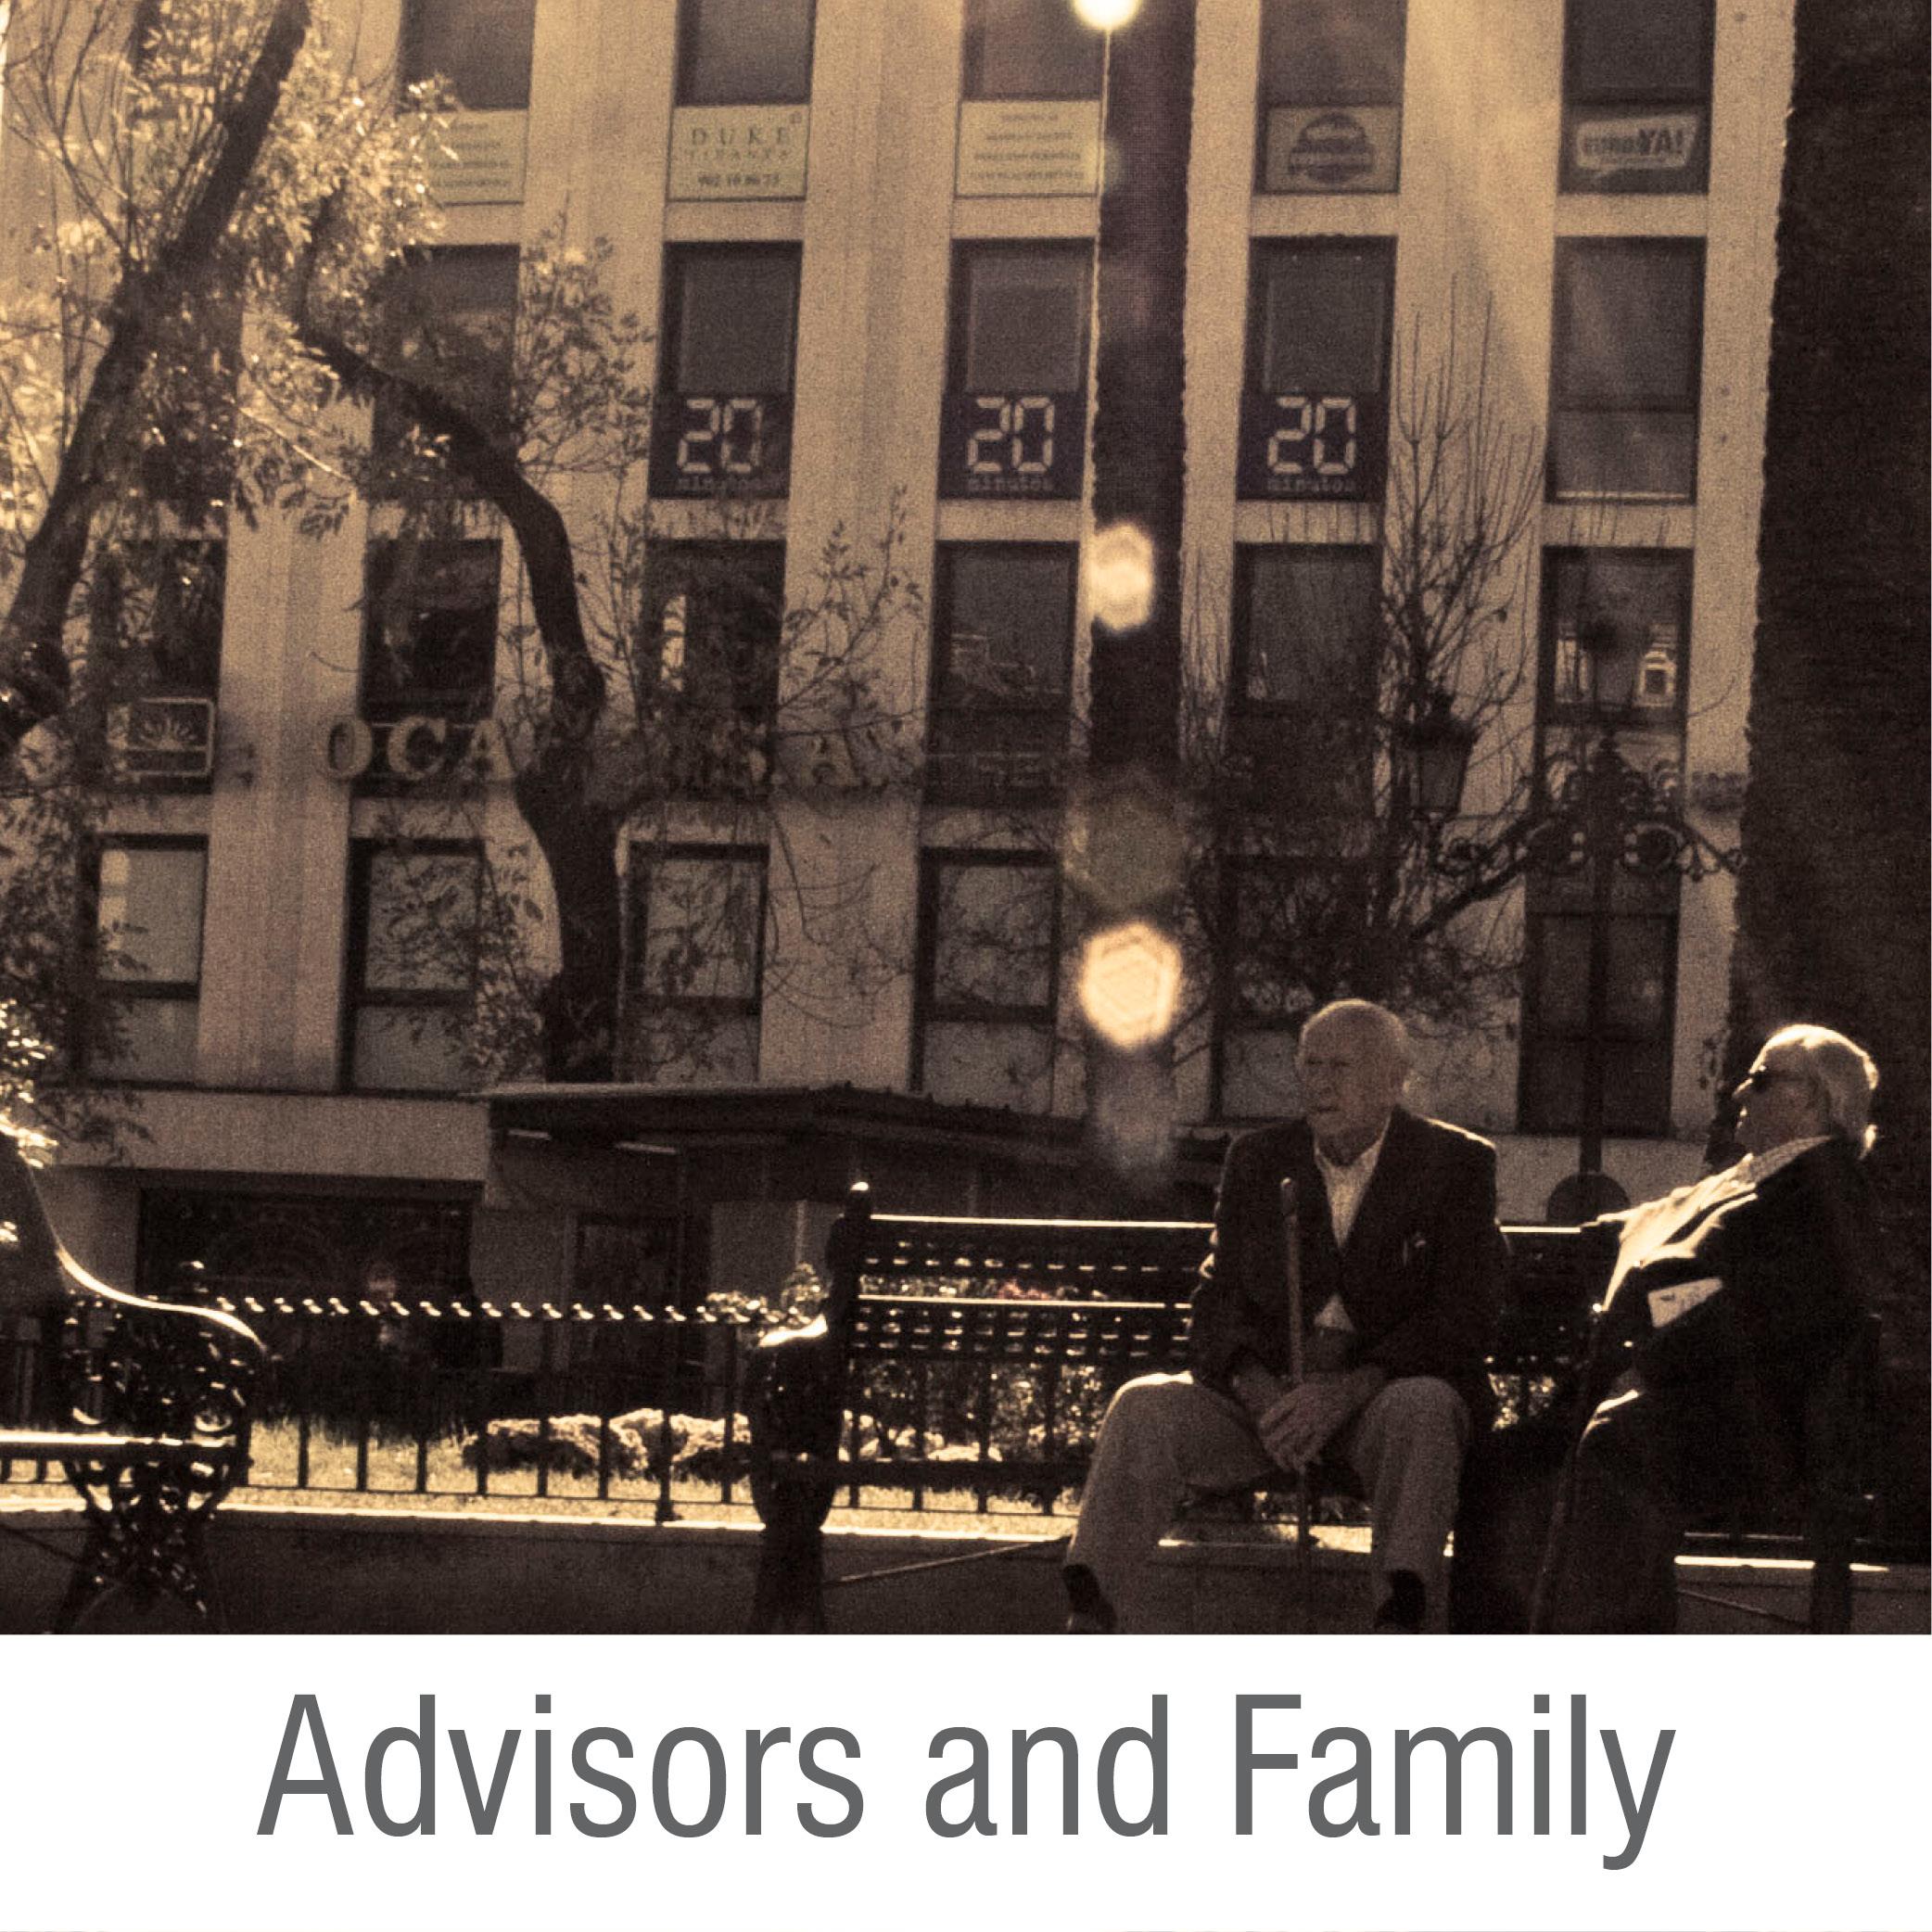 Advisors and Family